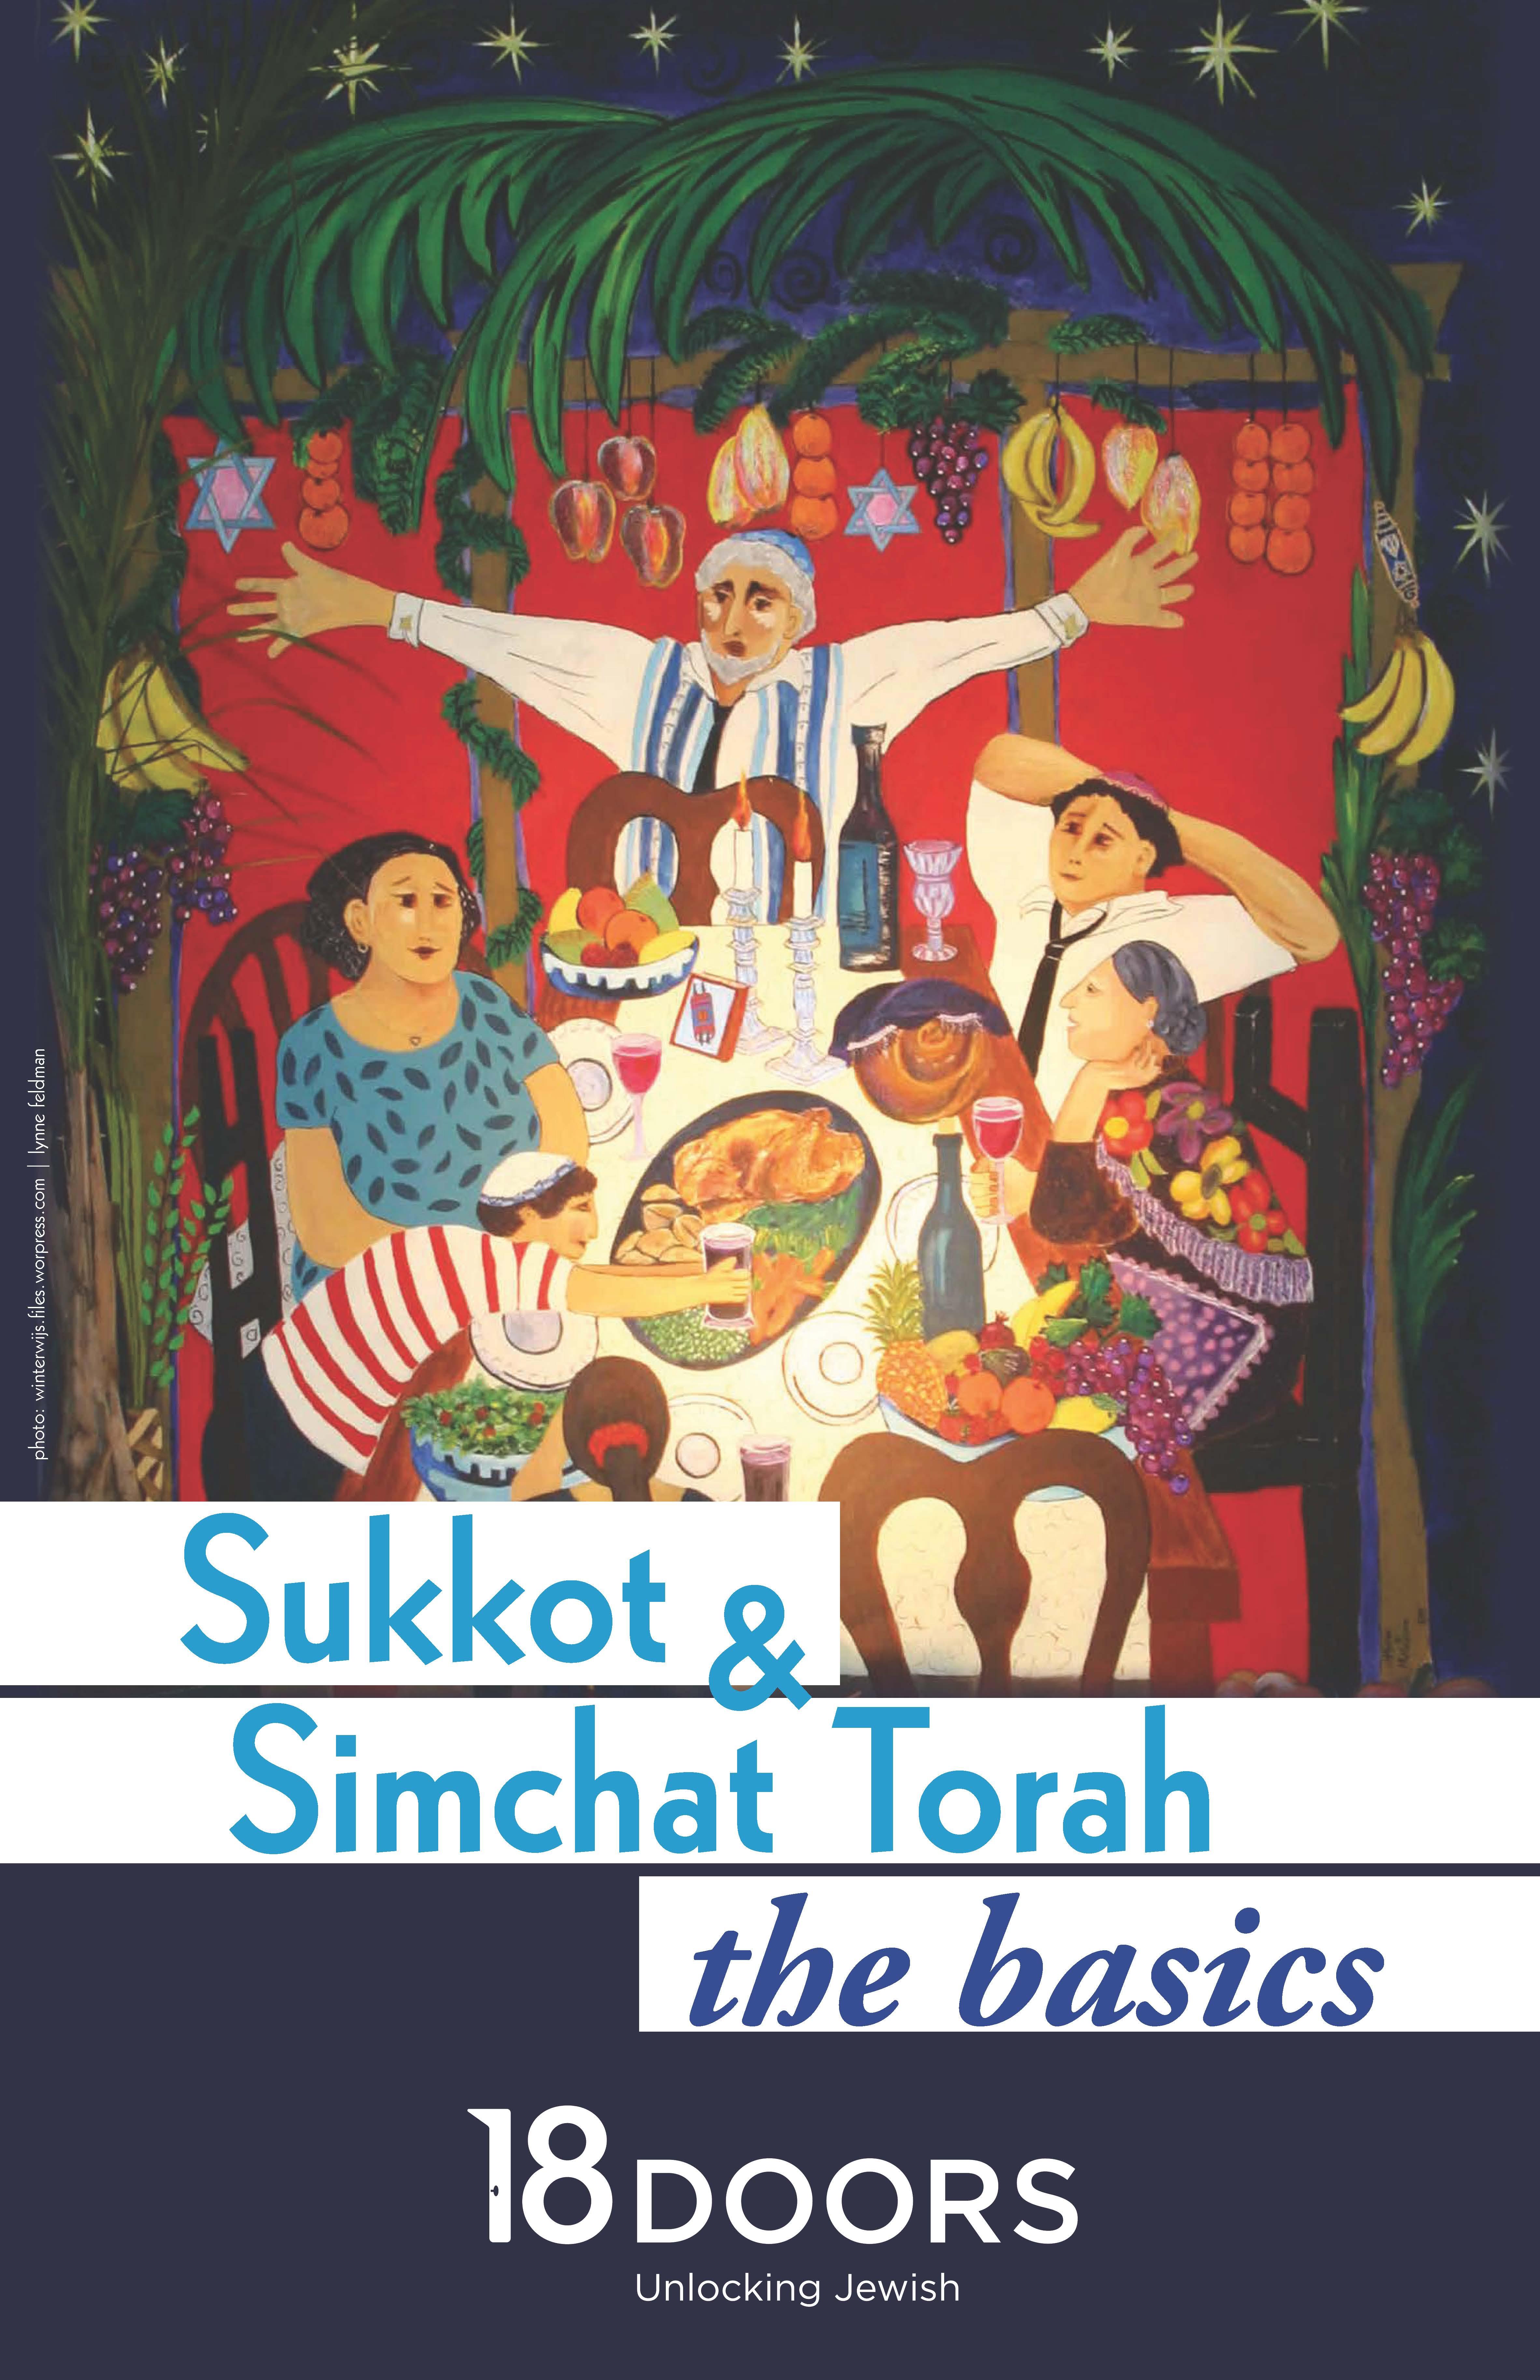 Sukkot and Simchat Torah: the Basics